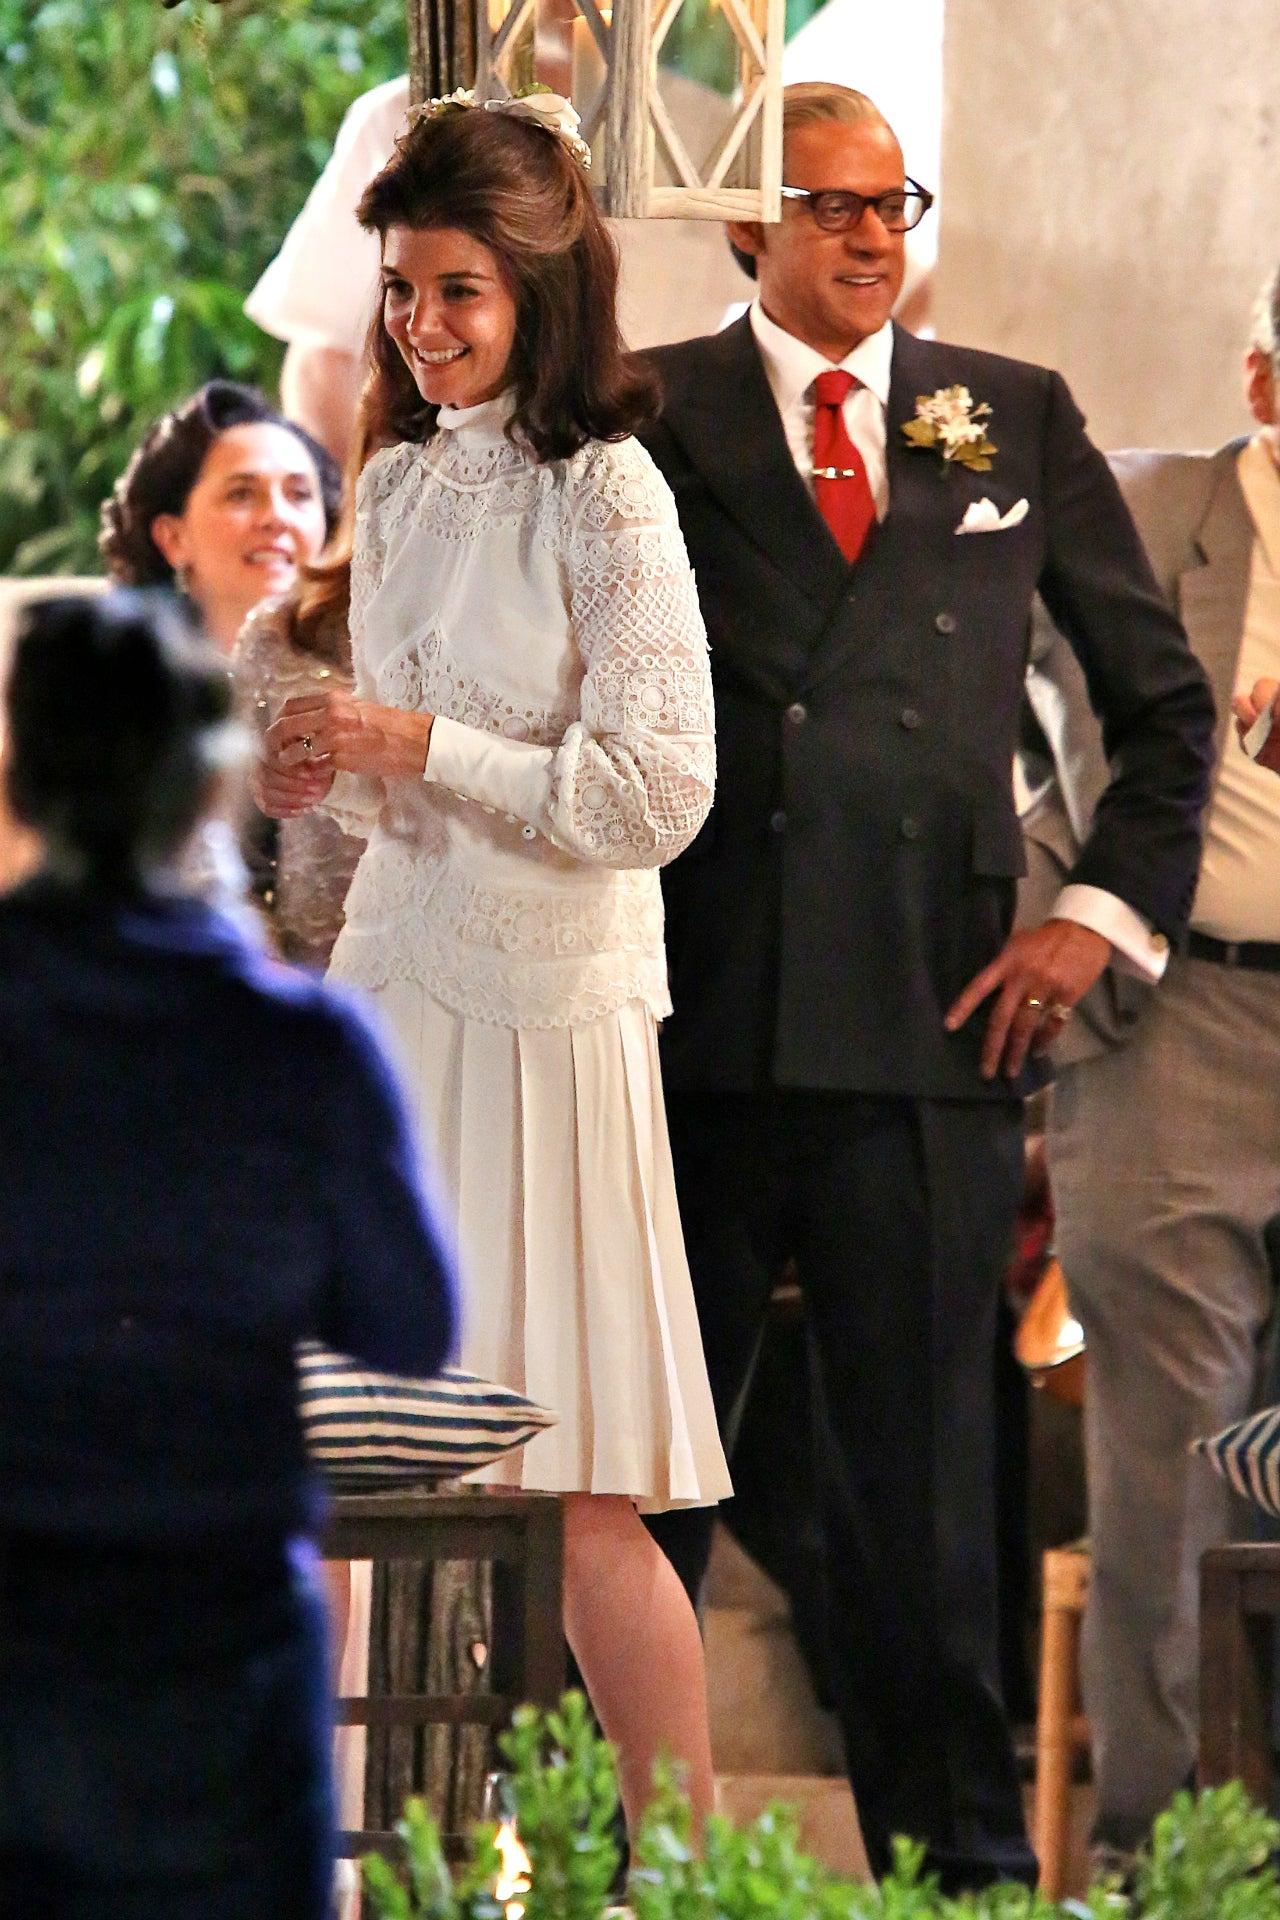 katie holmes glows as jackie kennedy in her wedding dress in the